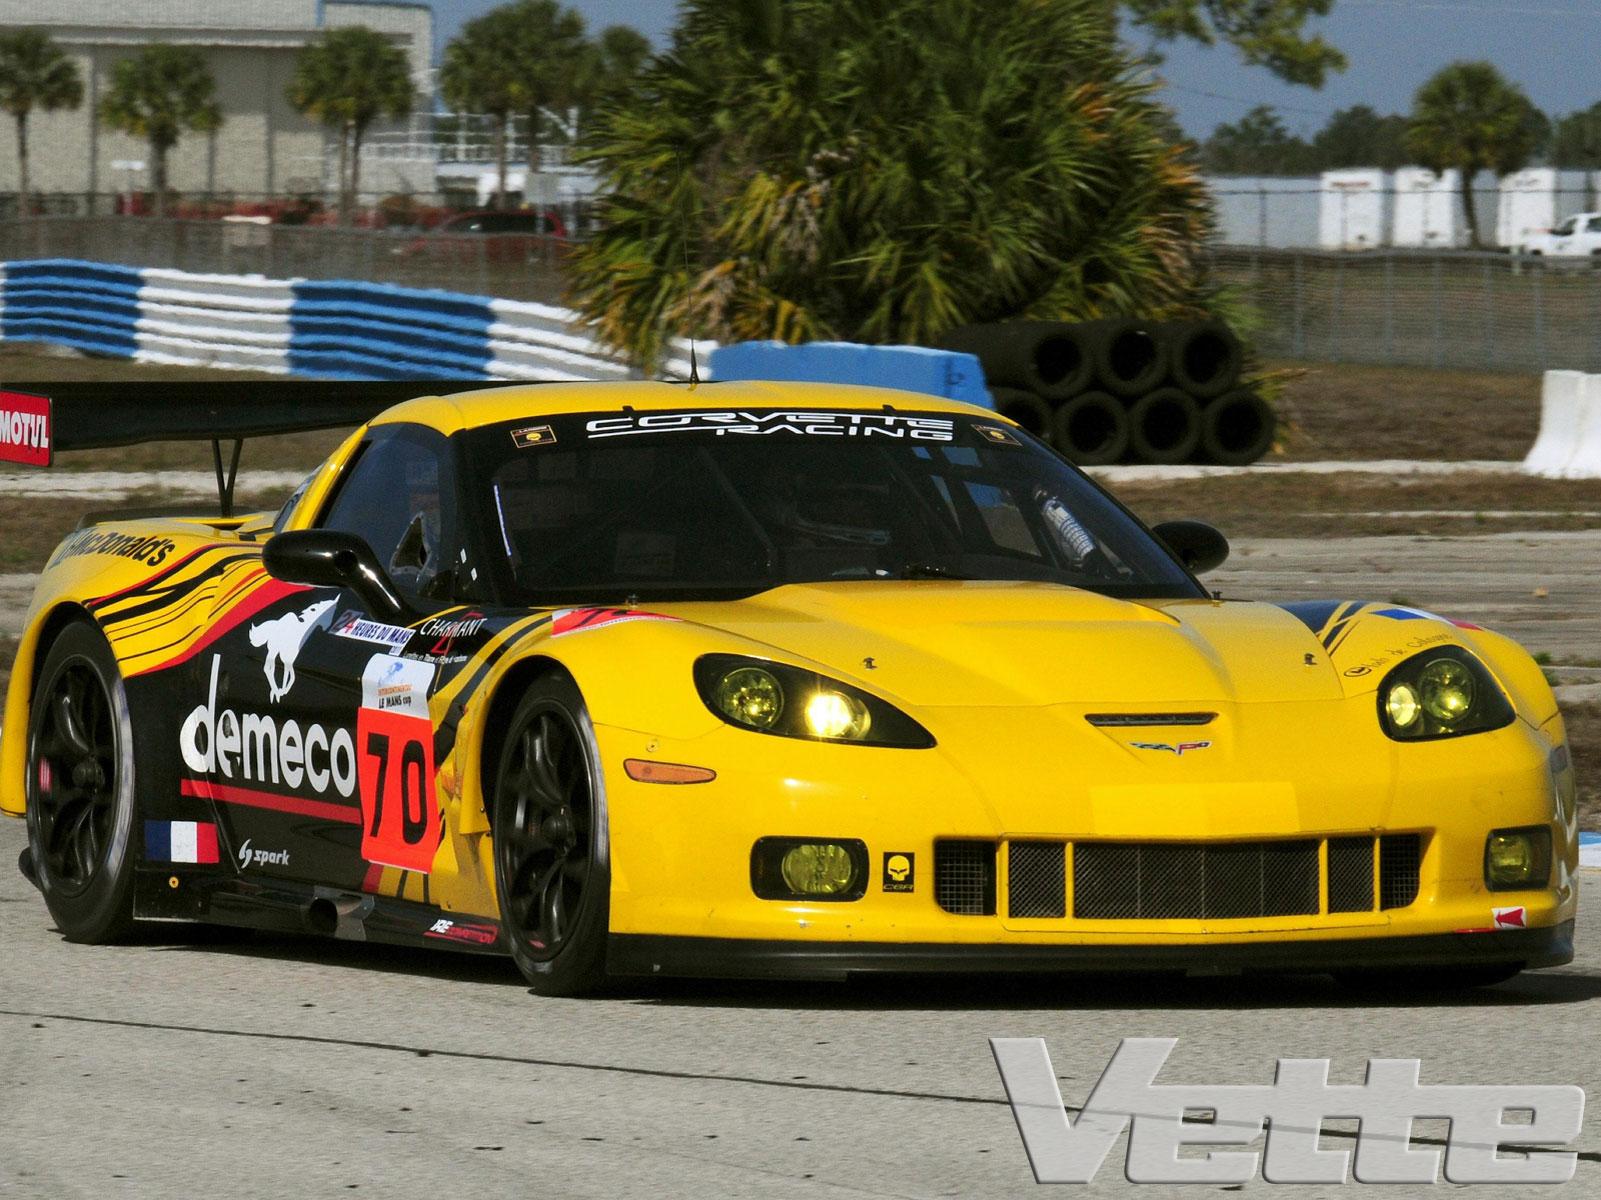 Vehicles   Corvette Chevy Chevrolet Race Car Hot Rod Wallpaper 1601x1200